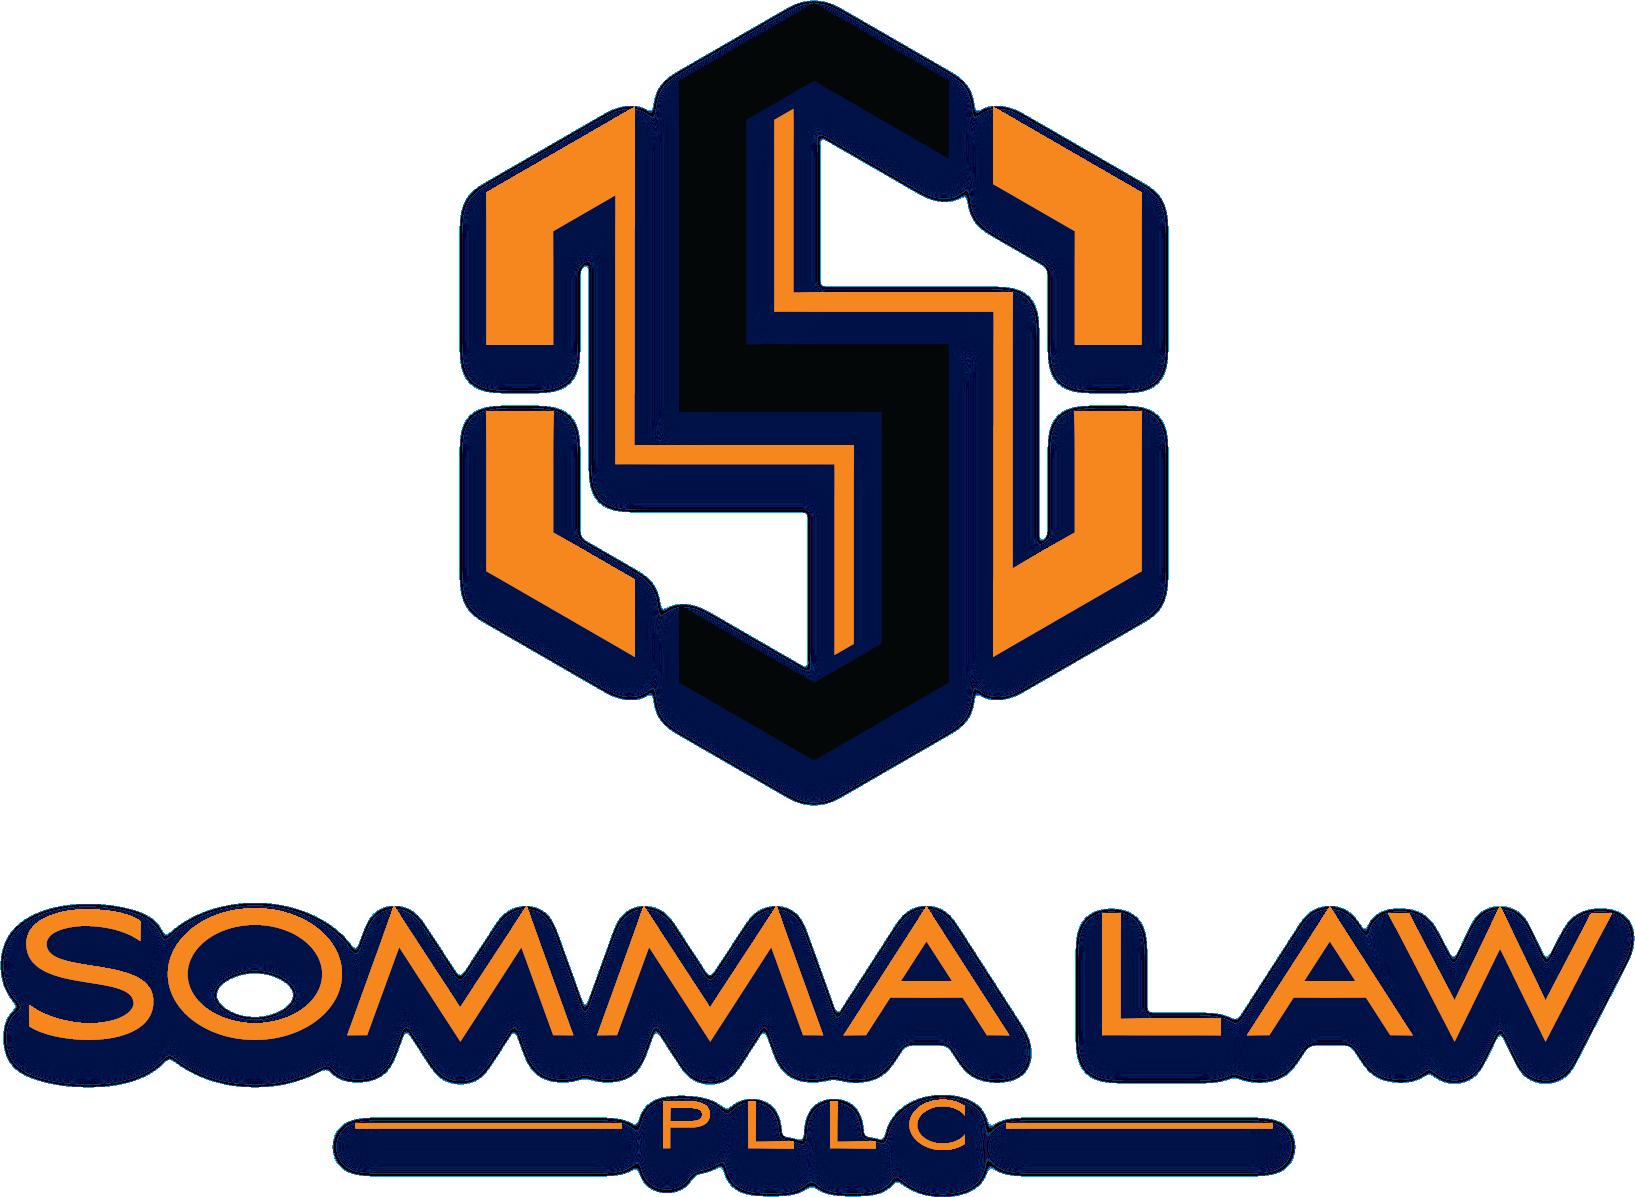 Somma Law PLLC